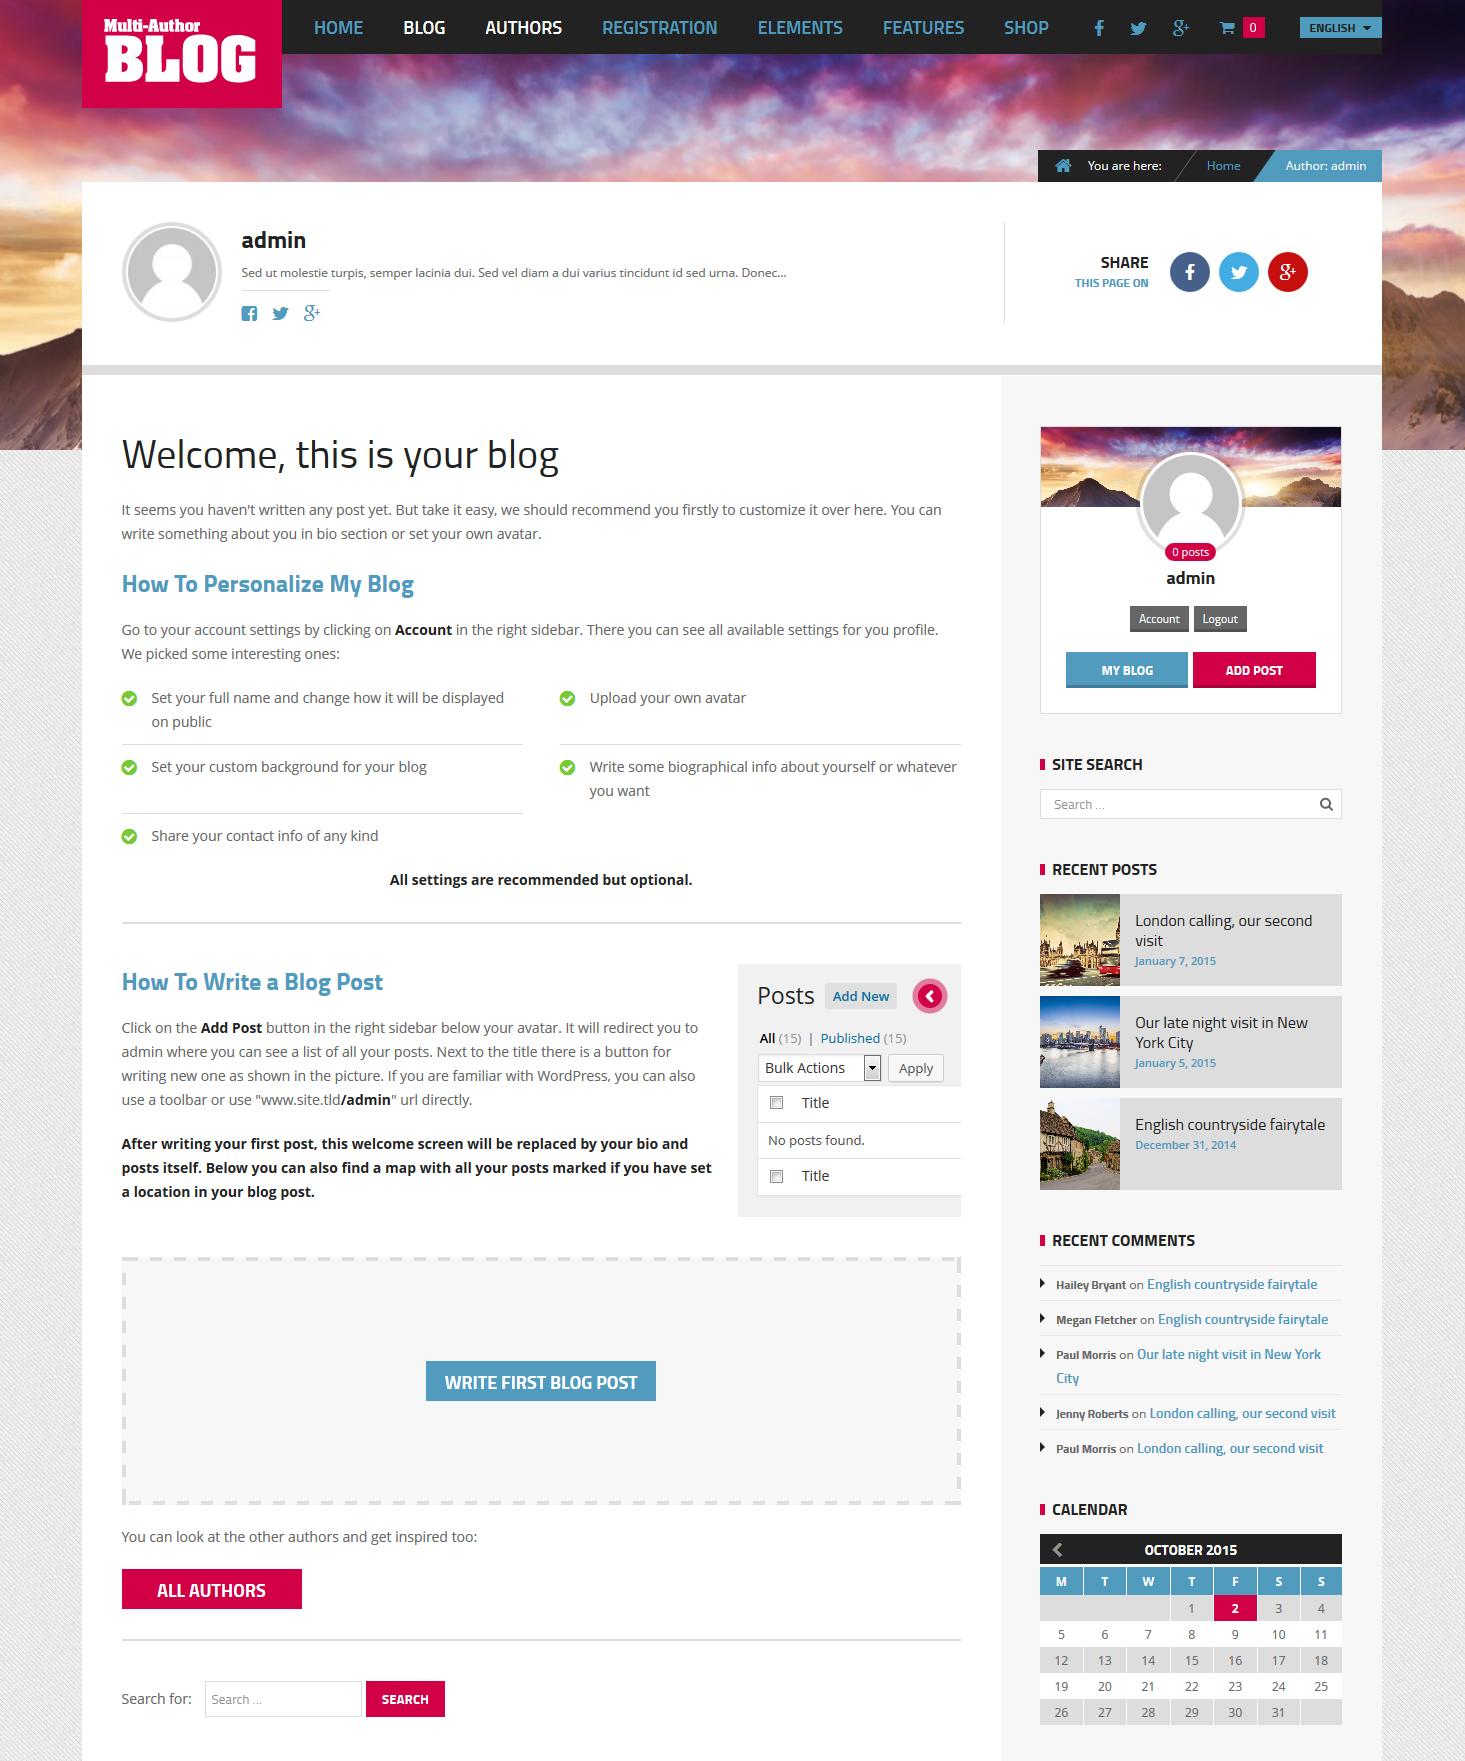 blog-welcome-screen